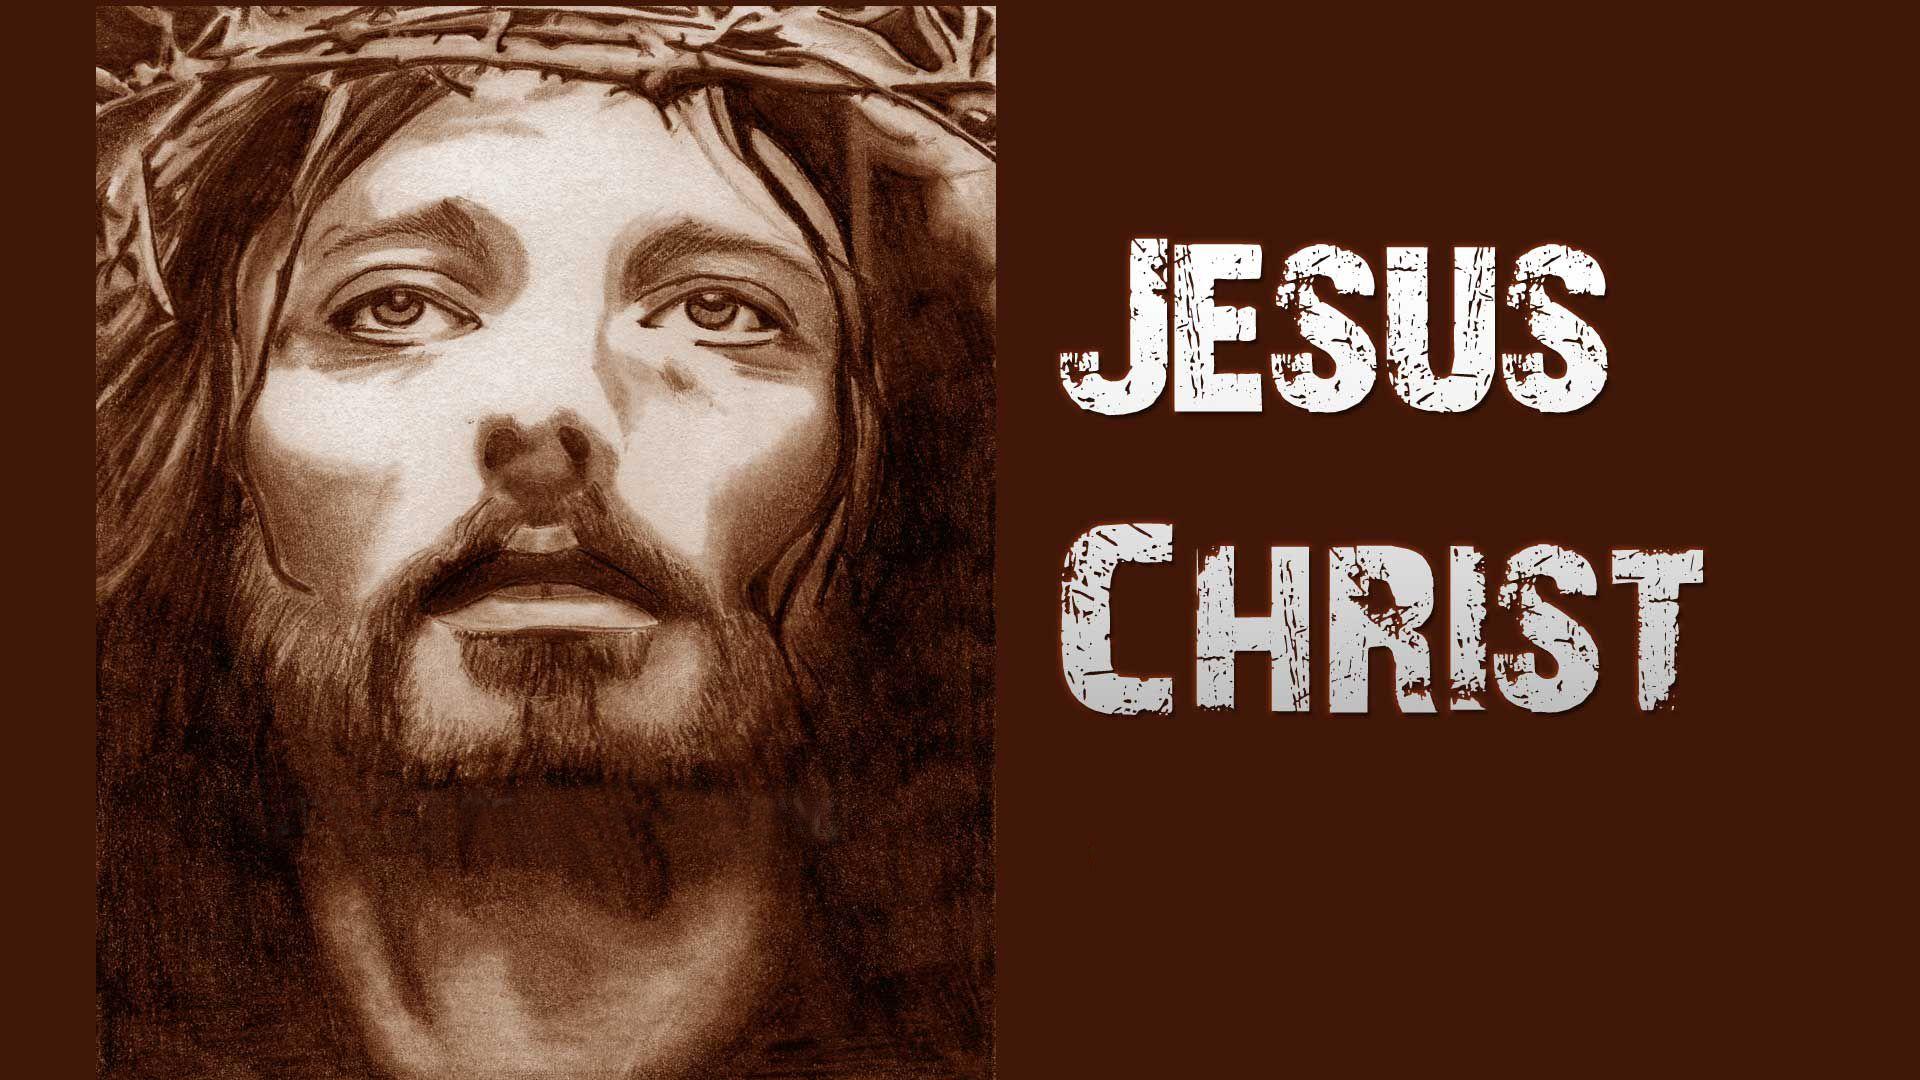 Lord Jesus Christ HDTV Wallpaper